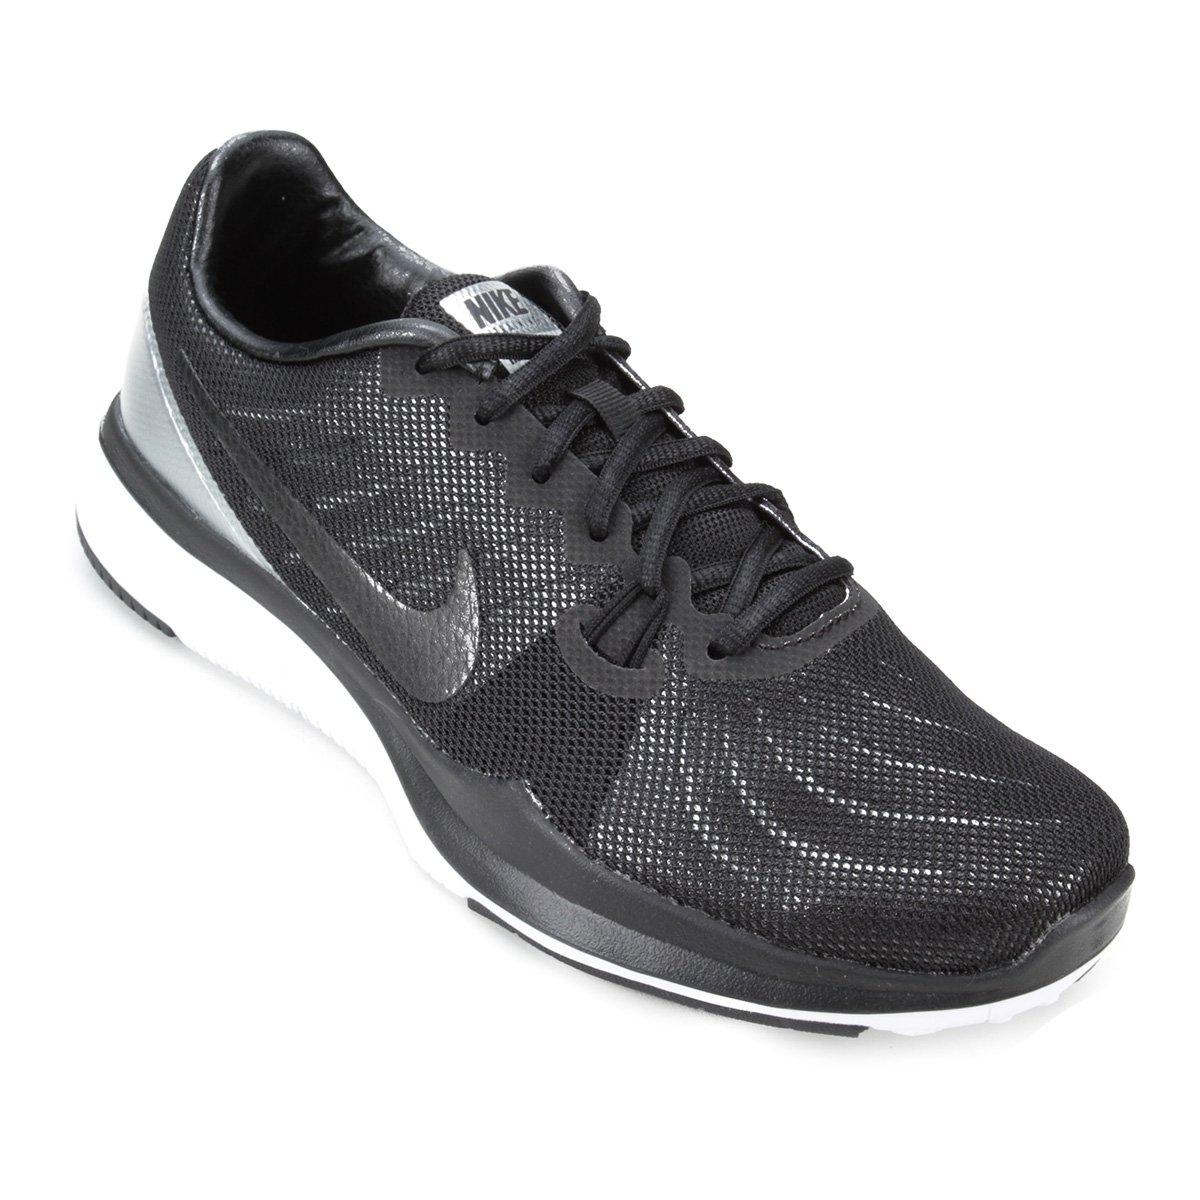 Compre Tenis Nike In Season Tr W Pinkbranco Online  b676936a5634b